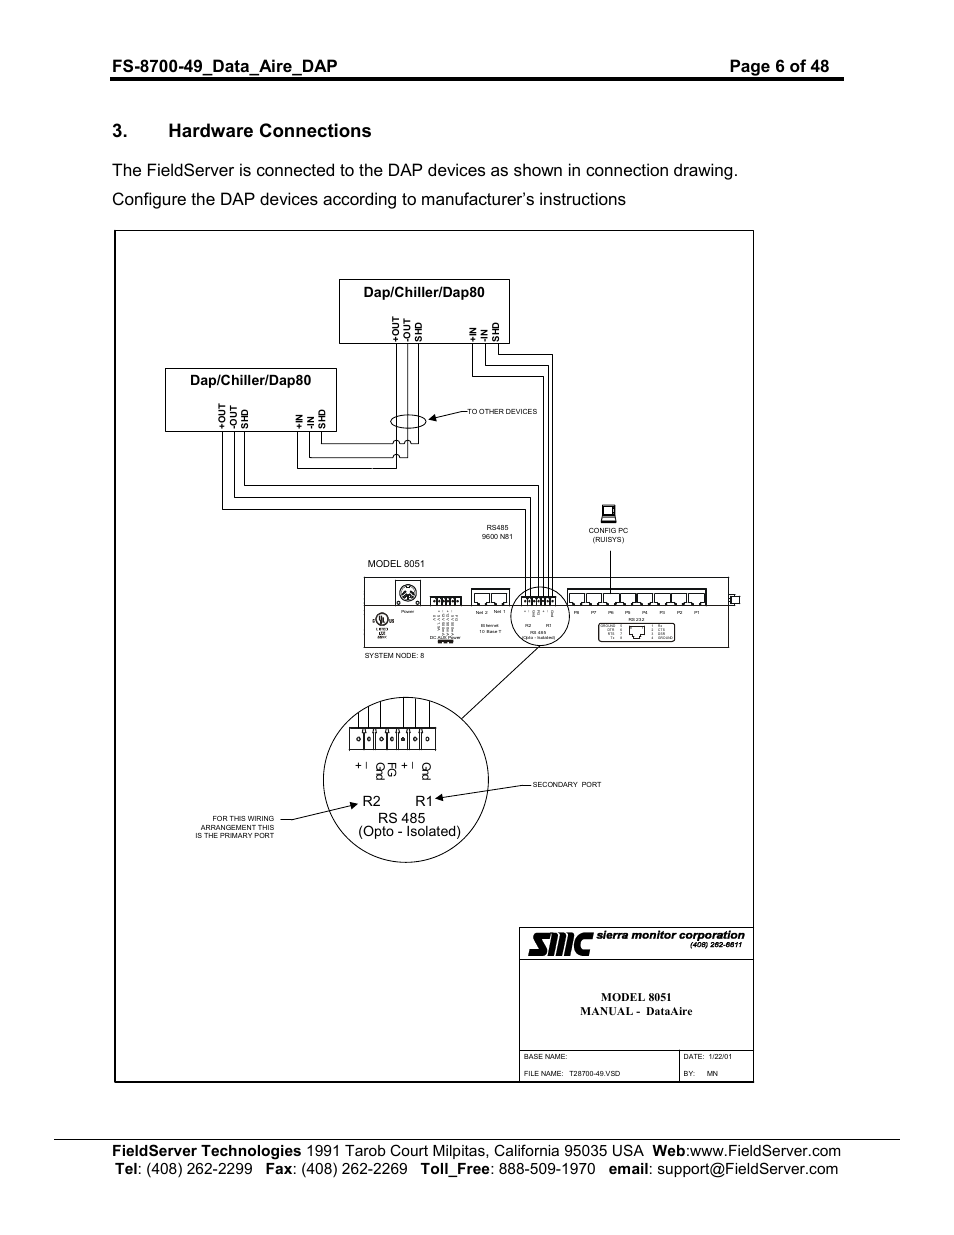 Hardware connections, Dap/chiller/dap80, Model 8051 manual - dataaire |  FieldServer Data Aire (DAP) FS-8704-49 User Manual | Page 6 / 48